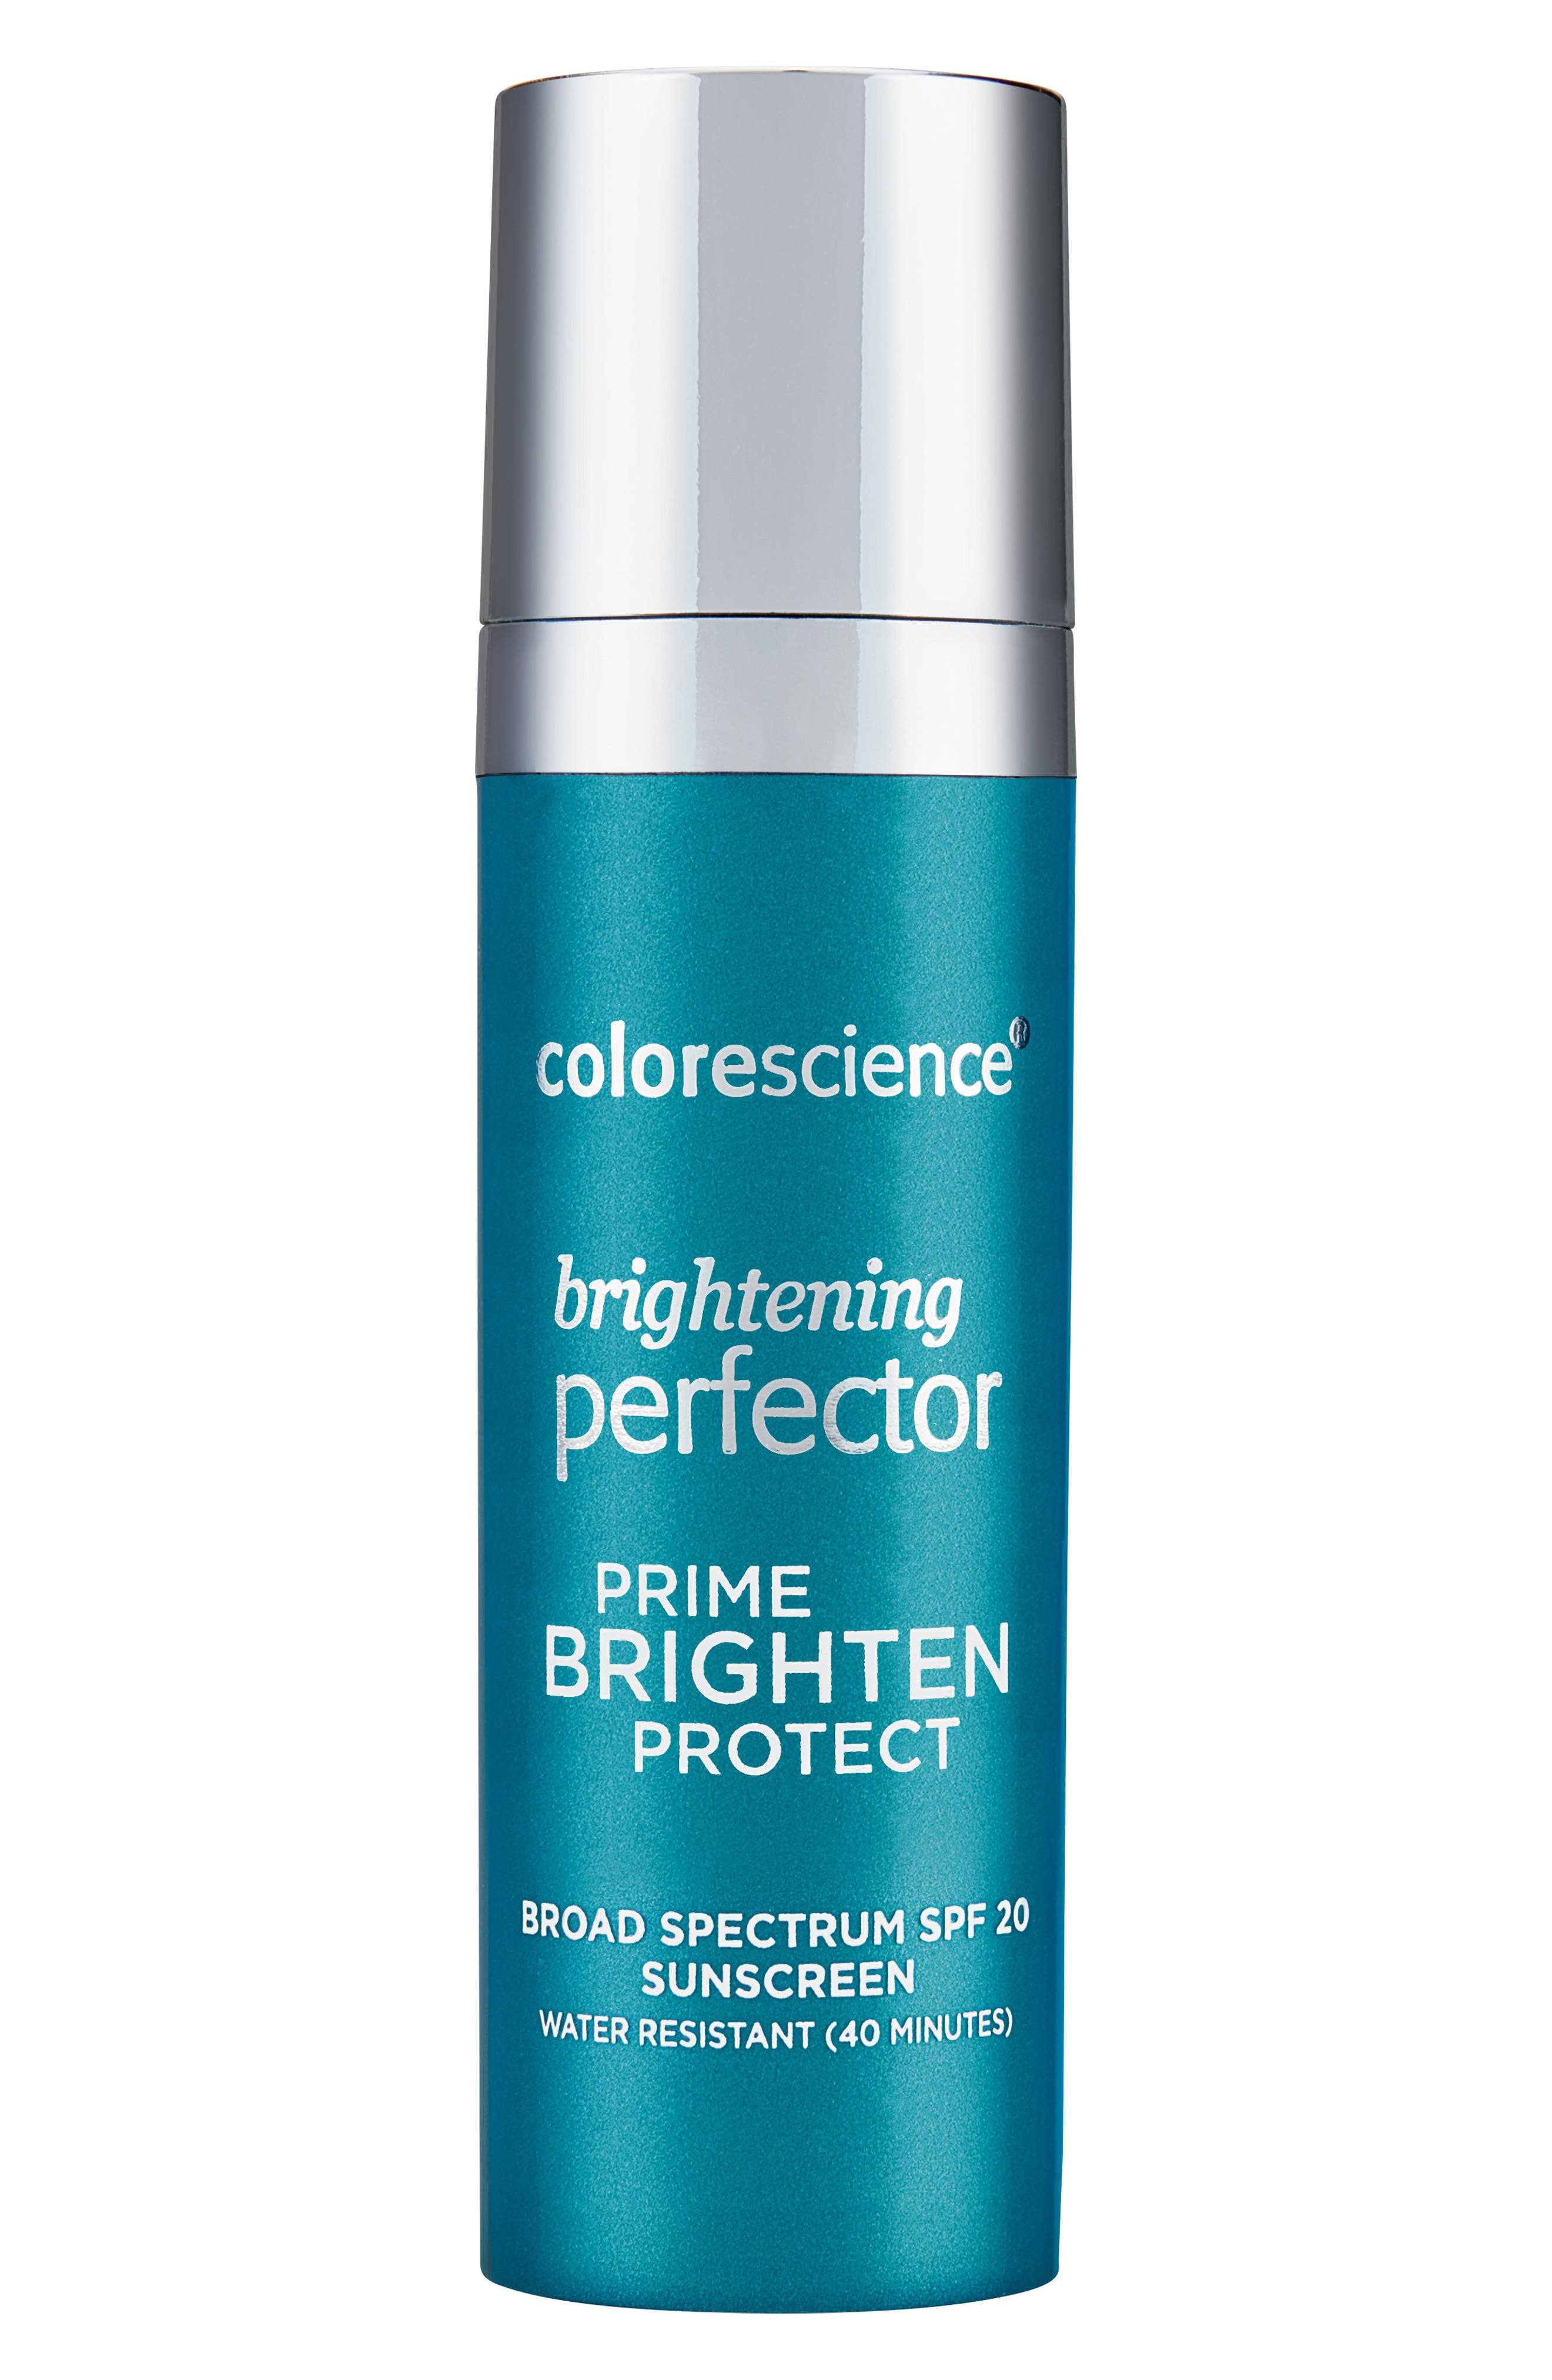 Colorescience® Brightening Perfector SPF 20